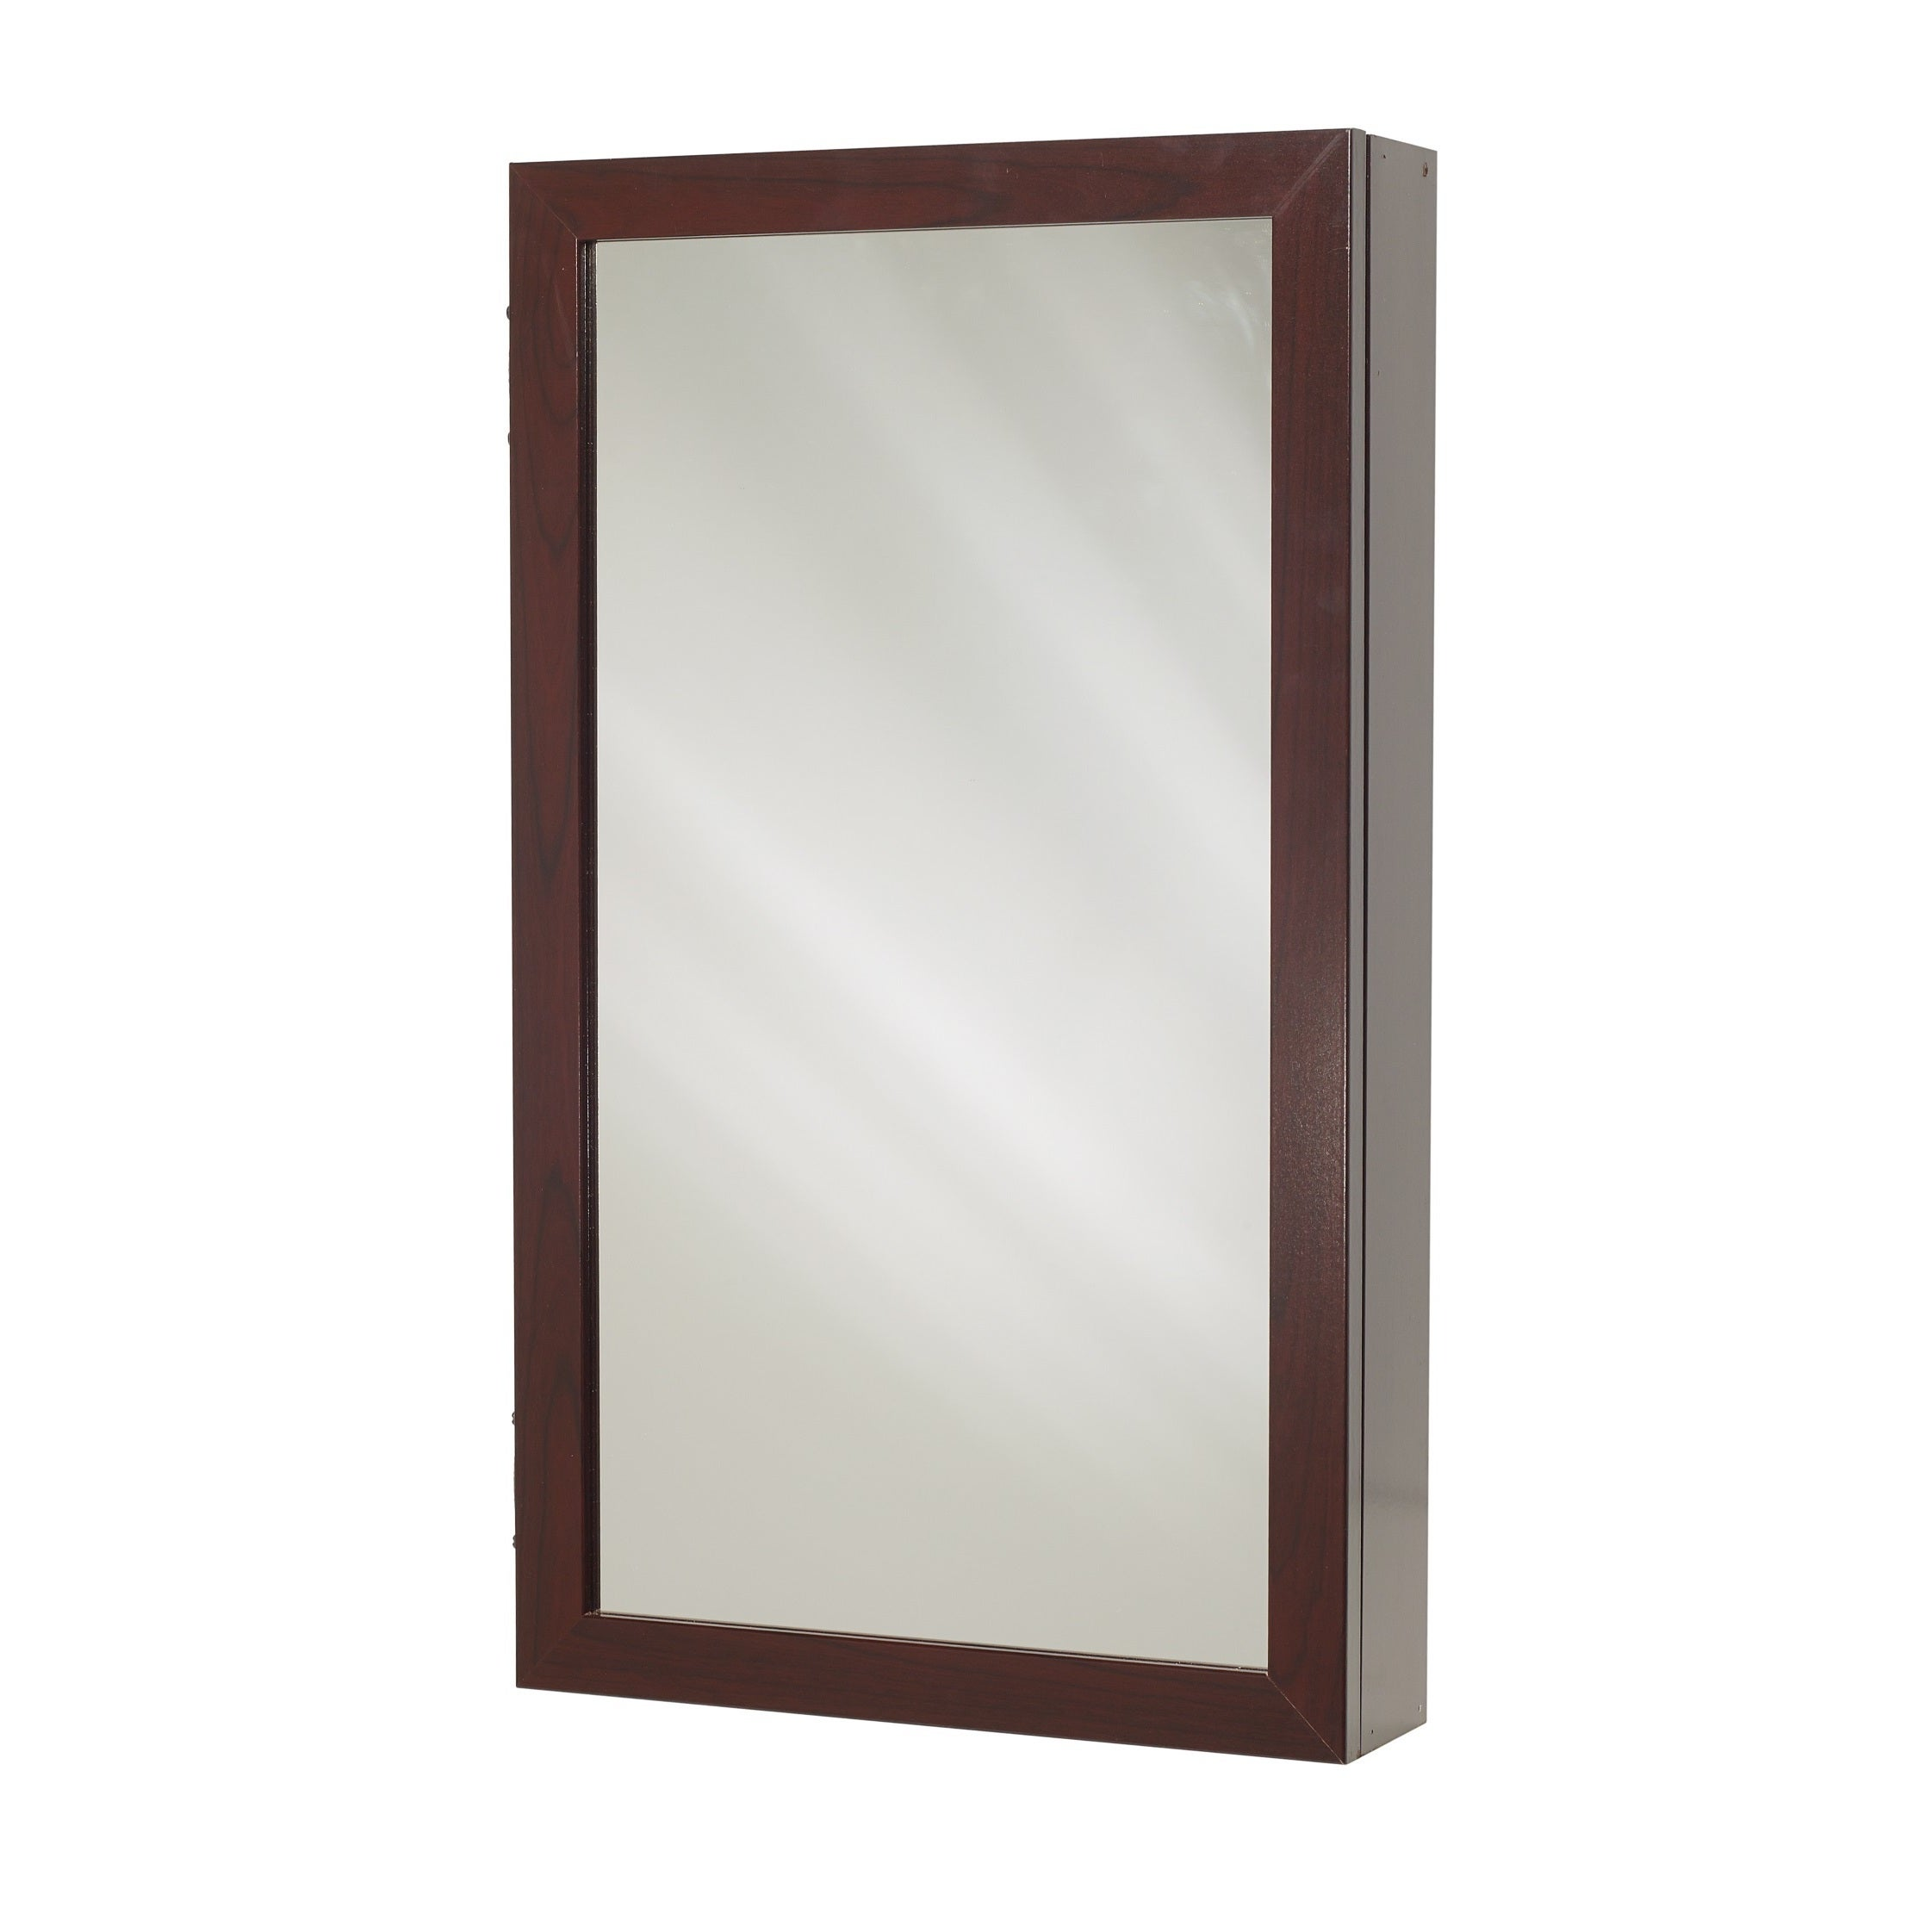 Butler EntryWay Armoire 14x24-mirror- White - Free Shipping Today ...